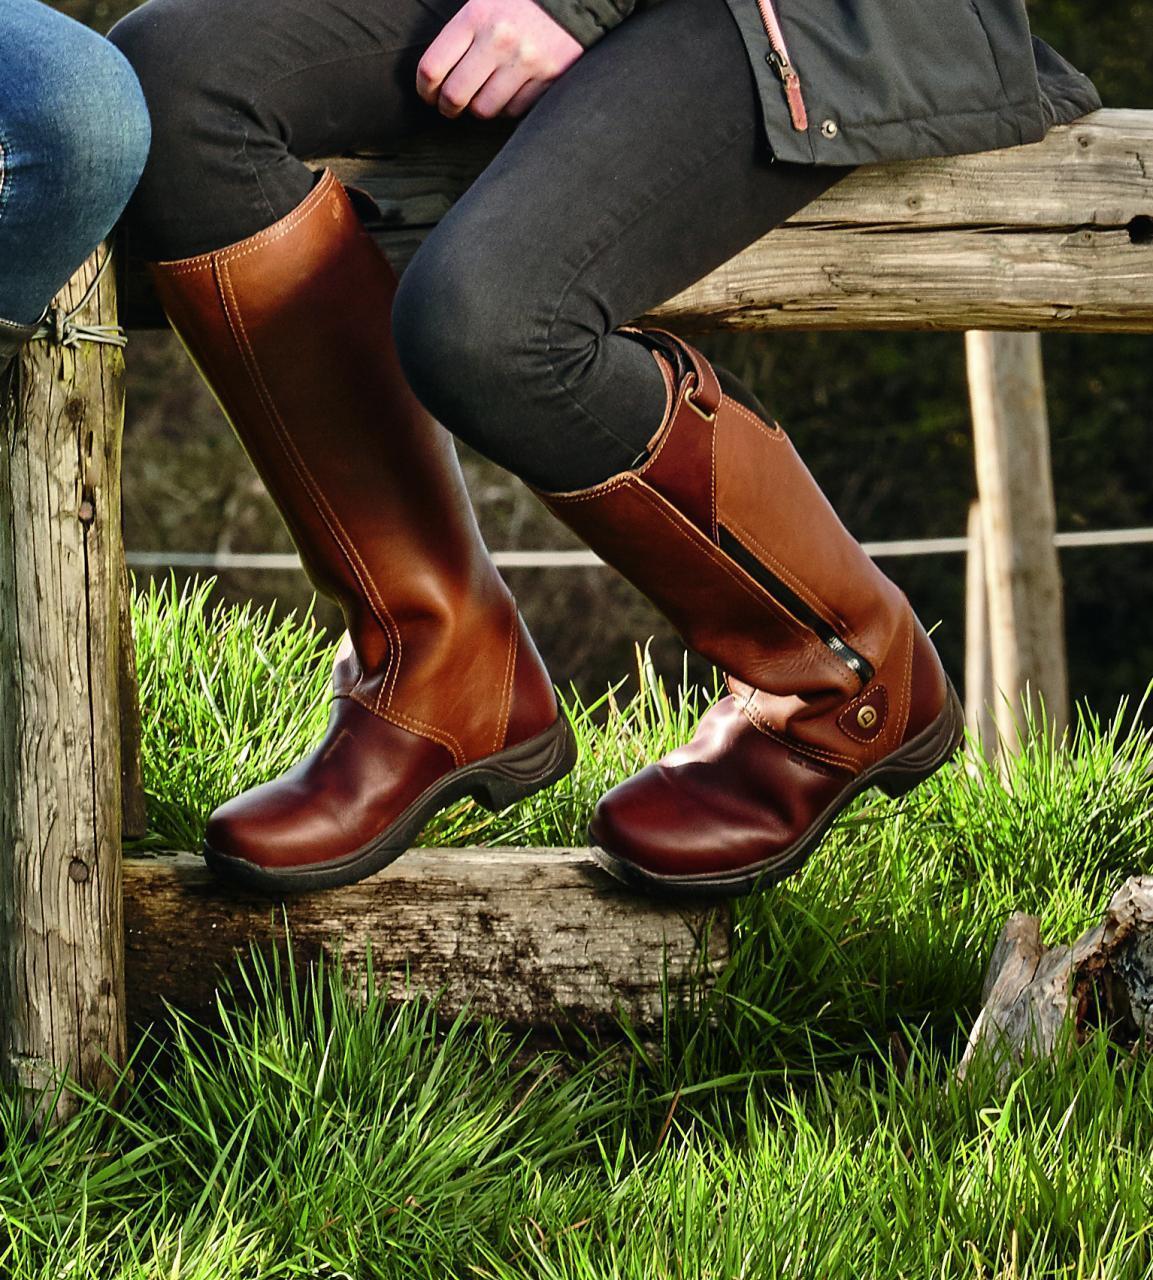 Dublin Wye Plena Flor Largo Del País  botas Montar Piel Impermeable Mundial Envío  Web oficial